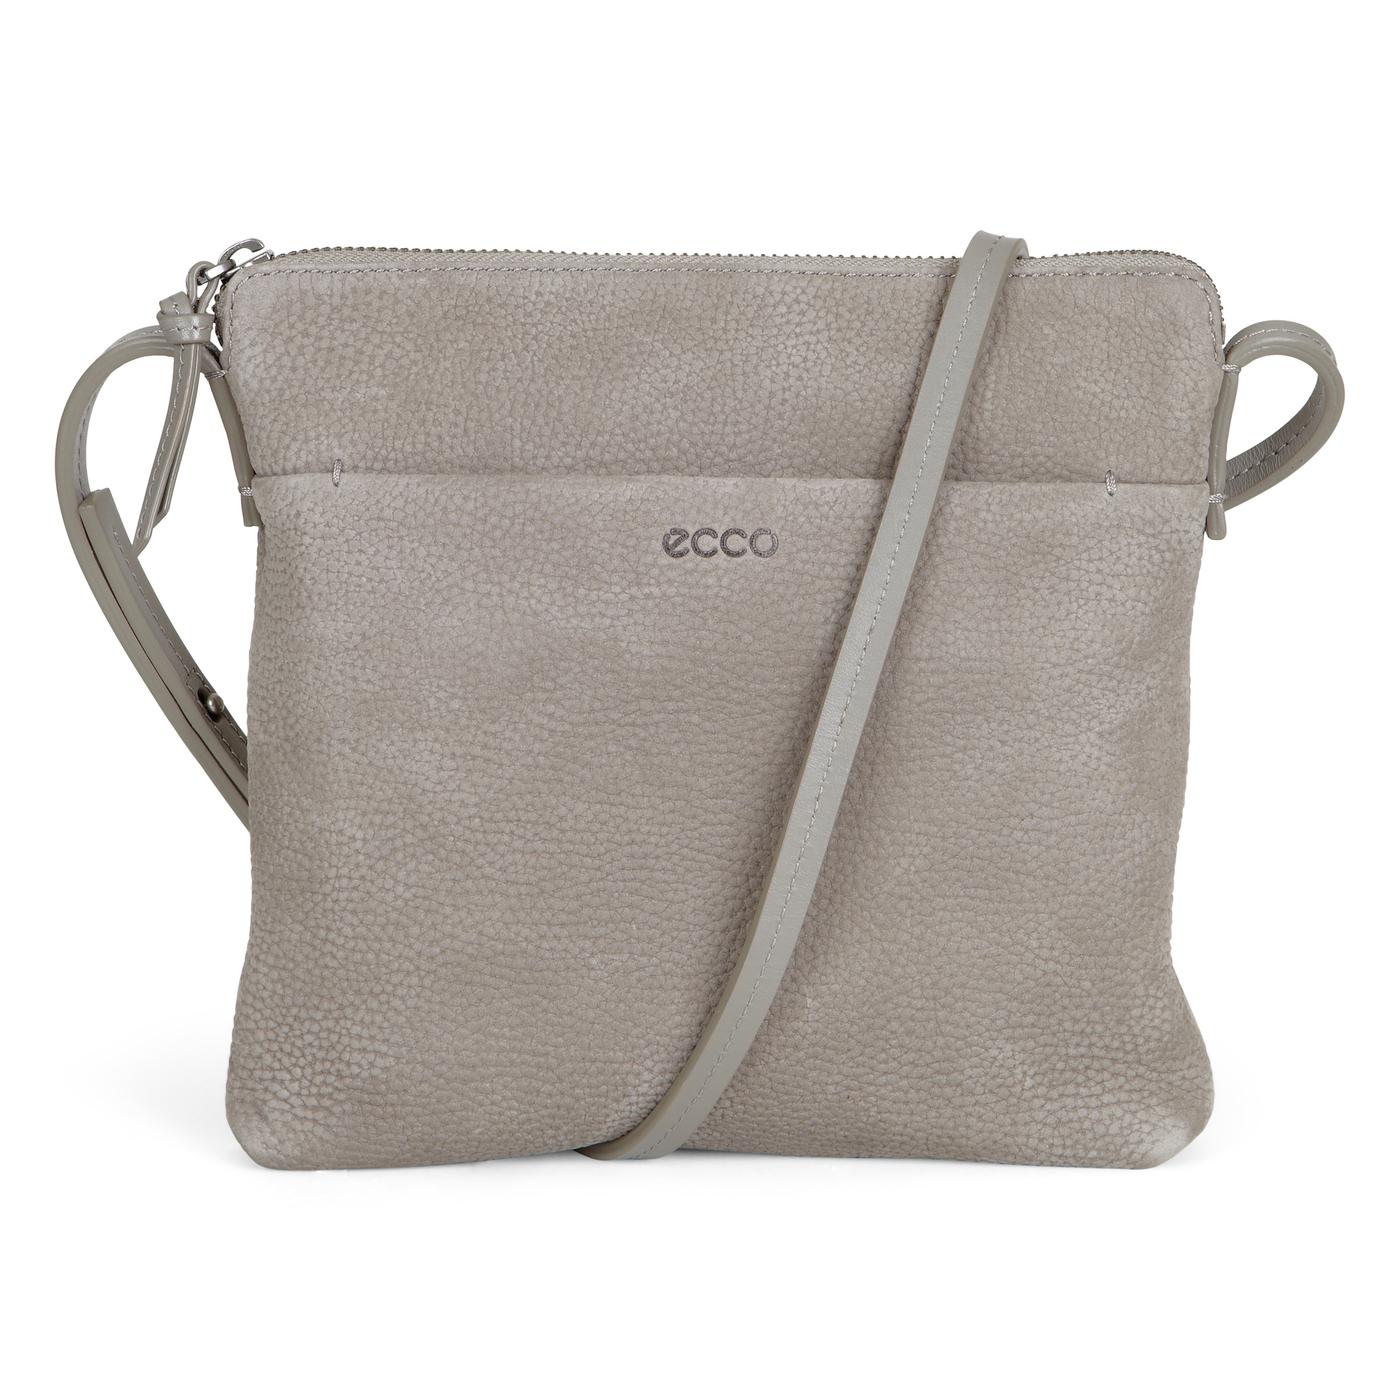 ECCO Handa Crossbody